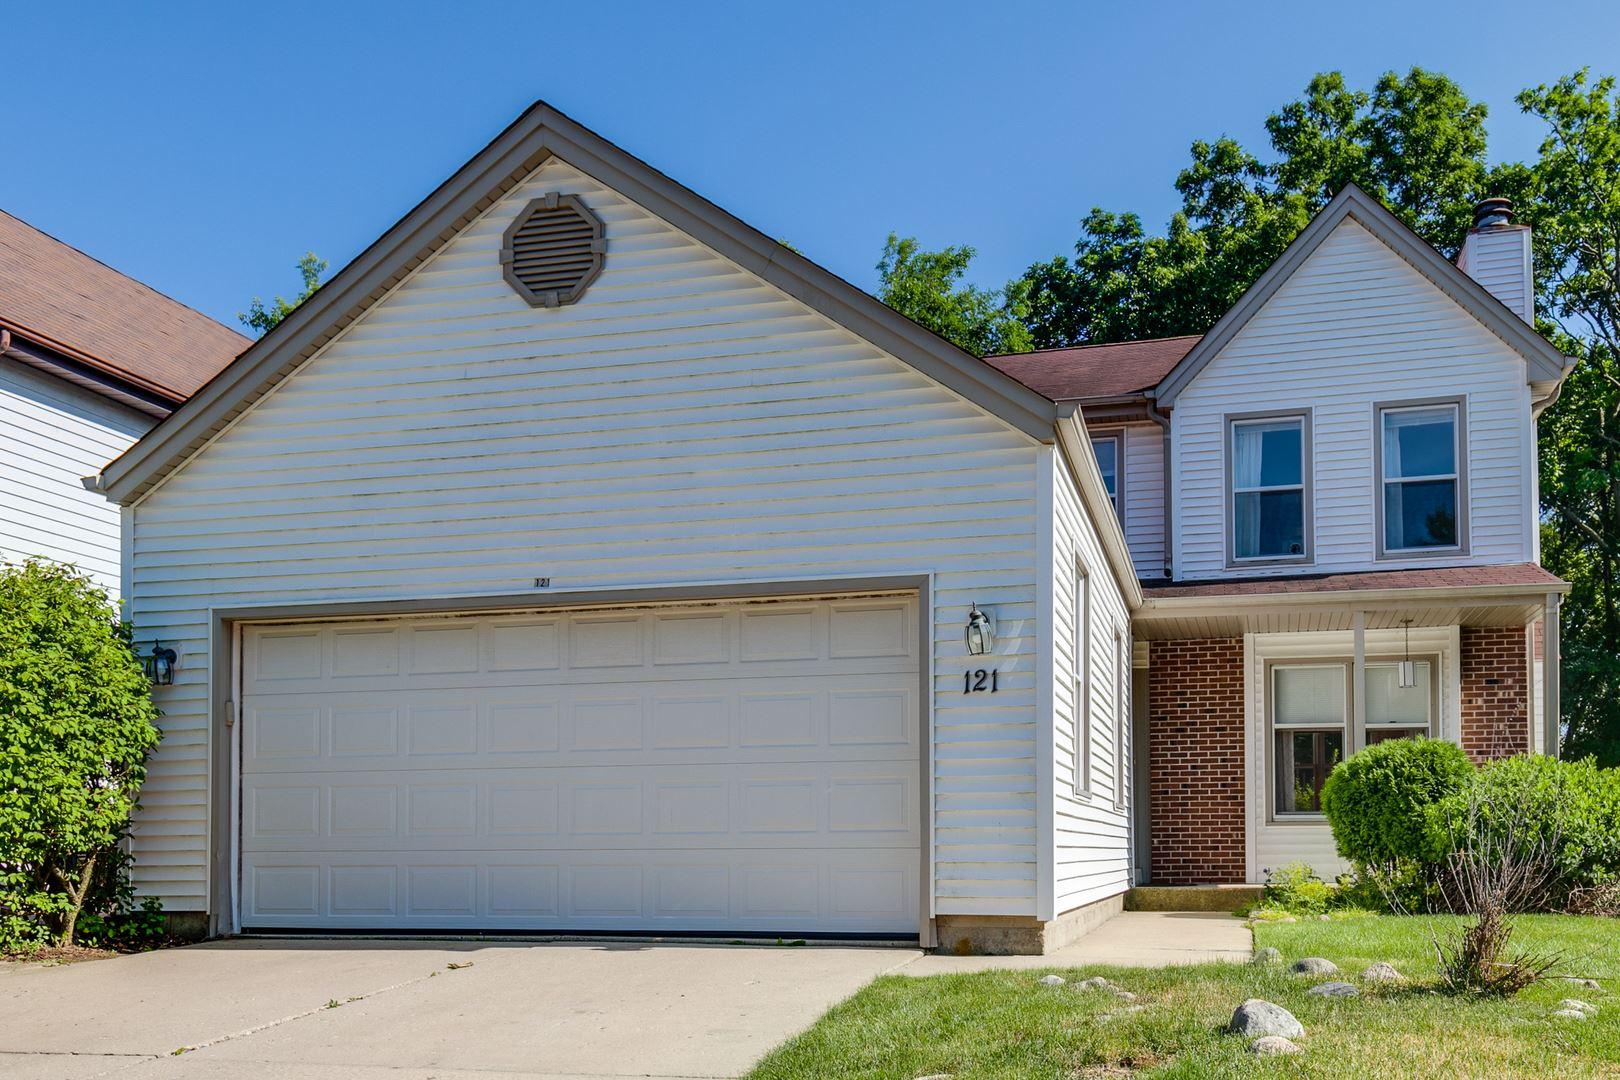 121 Pauline Avenue, Buffalo Grove, IL 60089 - #: 10773617